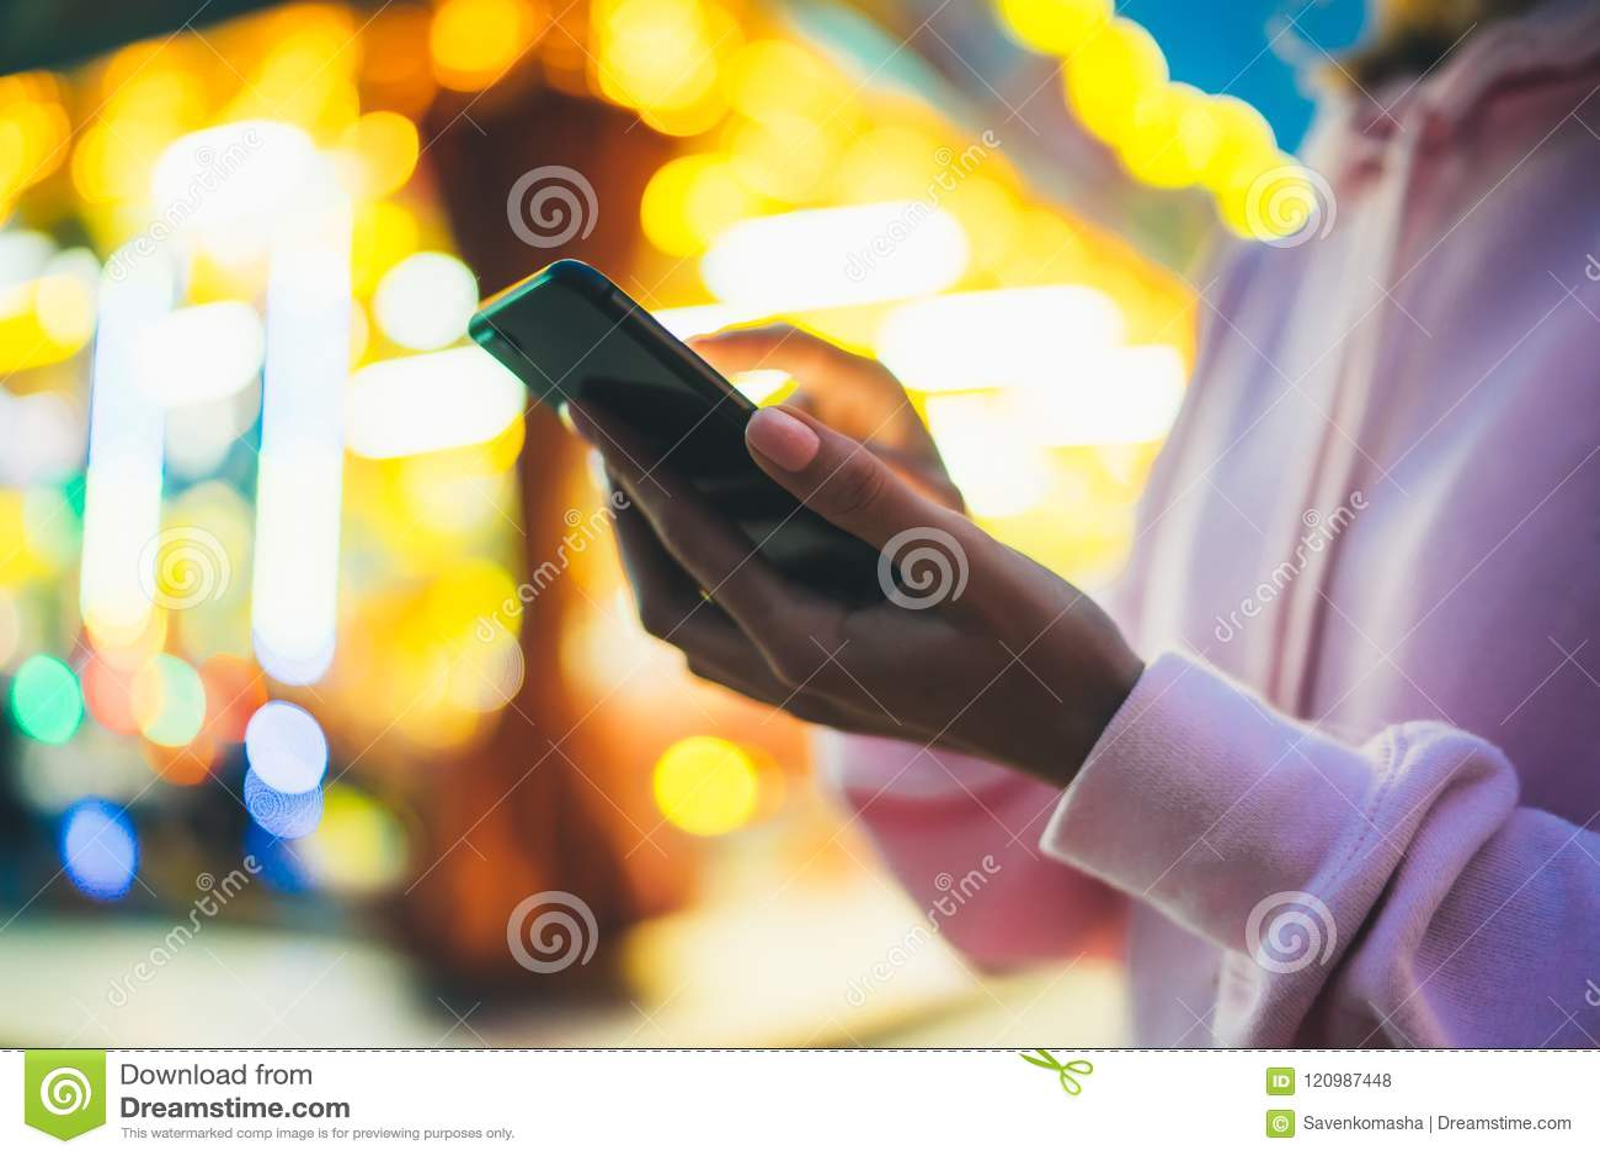 Girl pointing finger on screen smartphone on background bokeh light in night atmospheric city illumination in evening street defoc